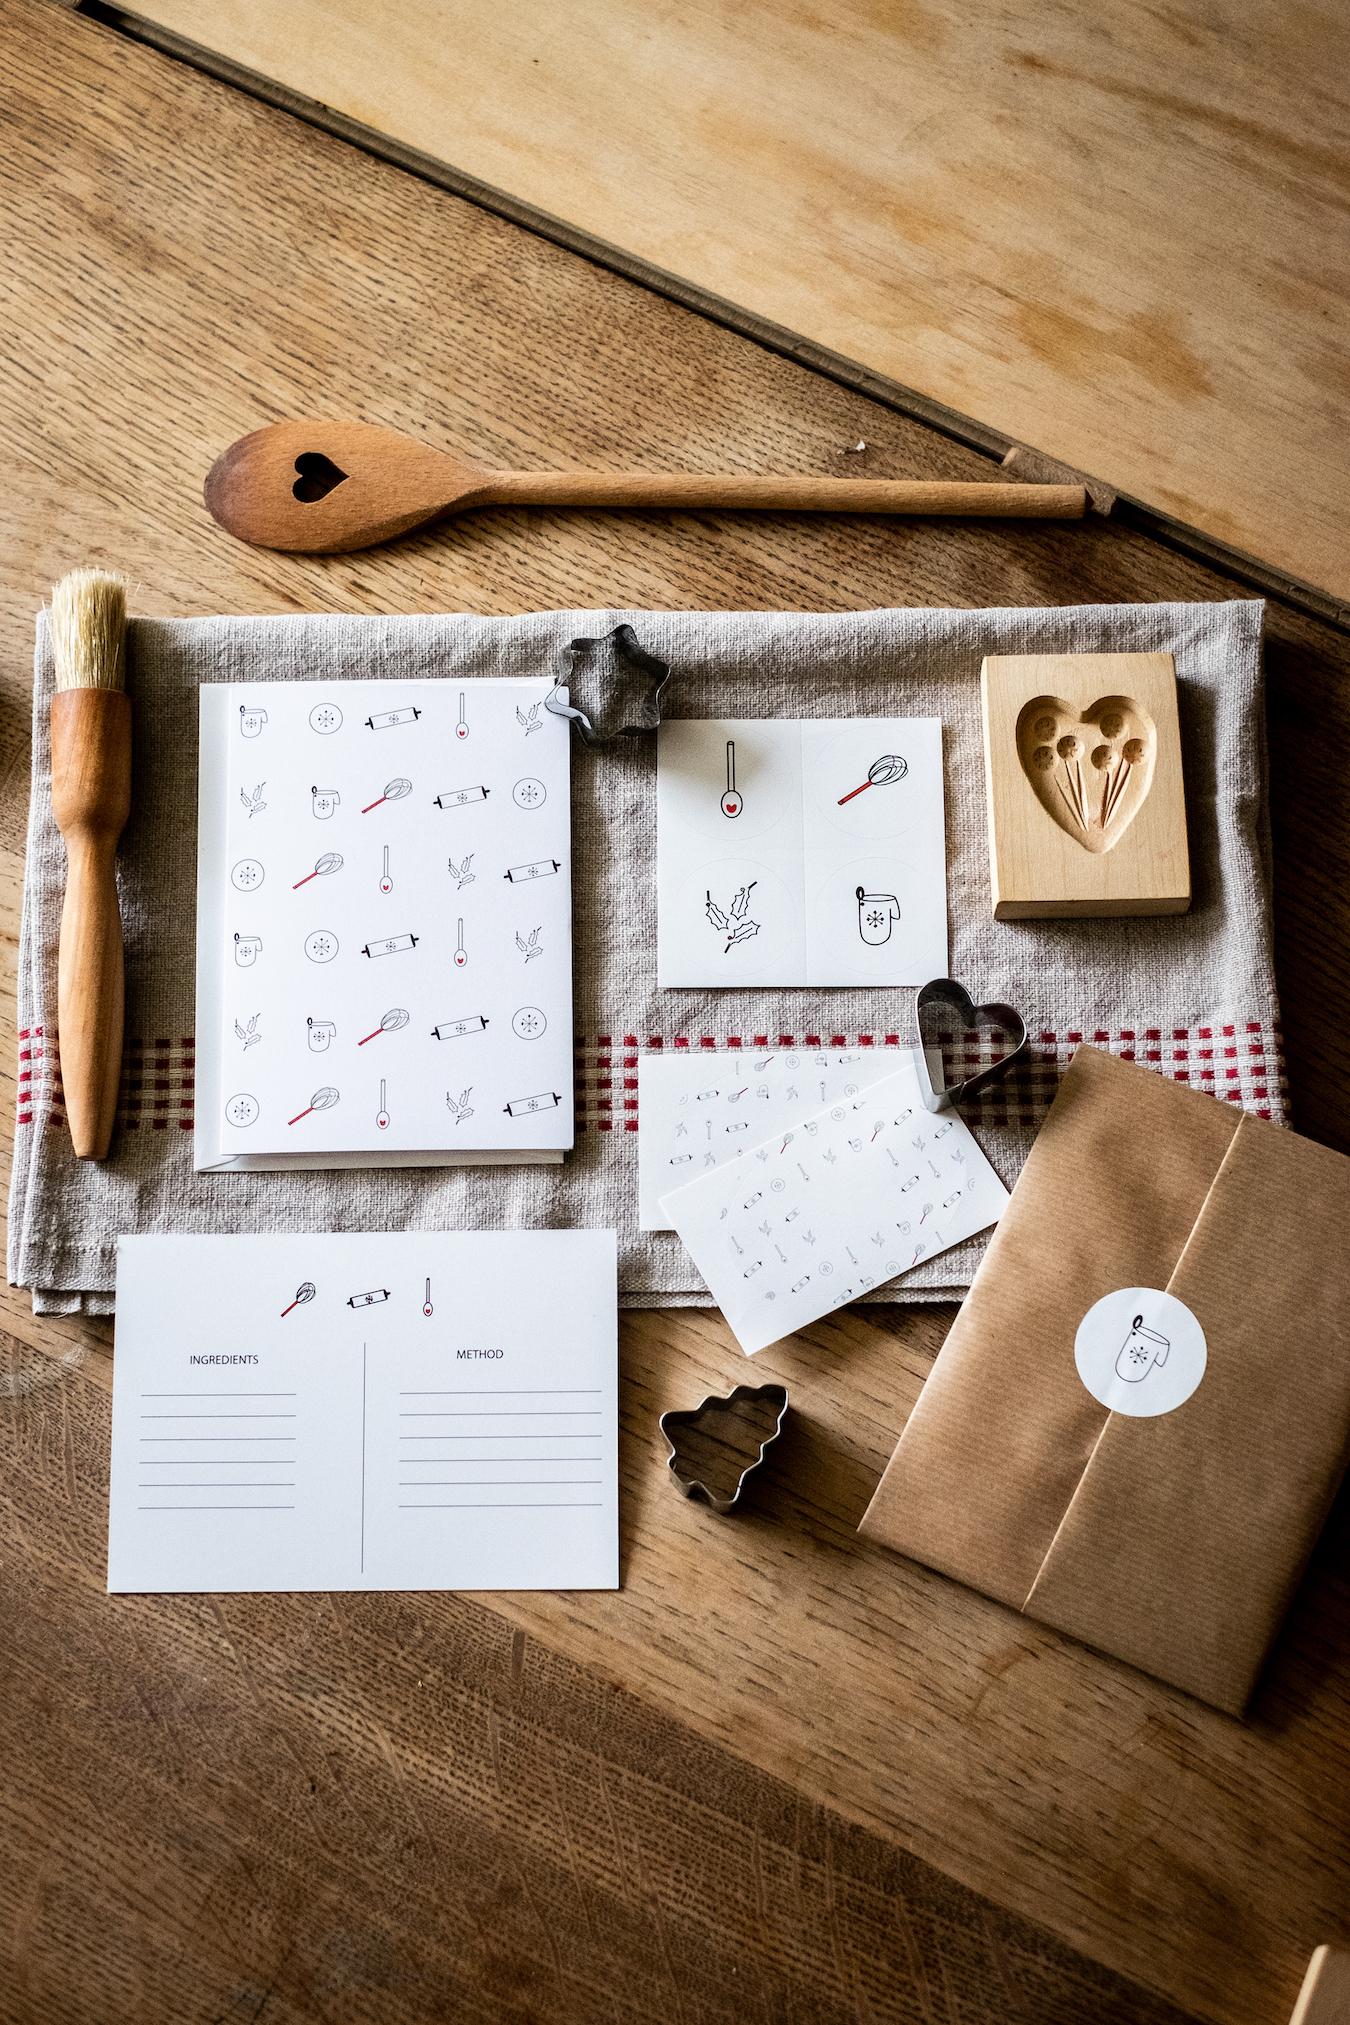 Festive Baking Stationery Set with wrap 2 copy